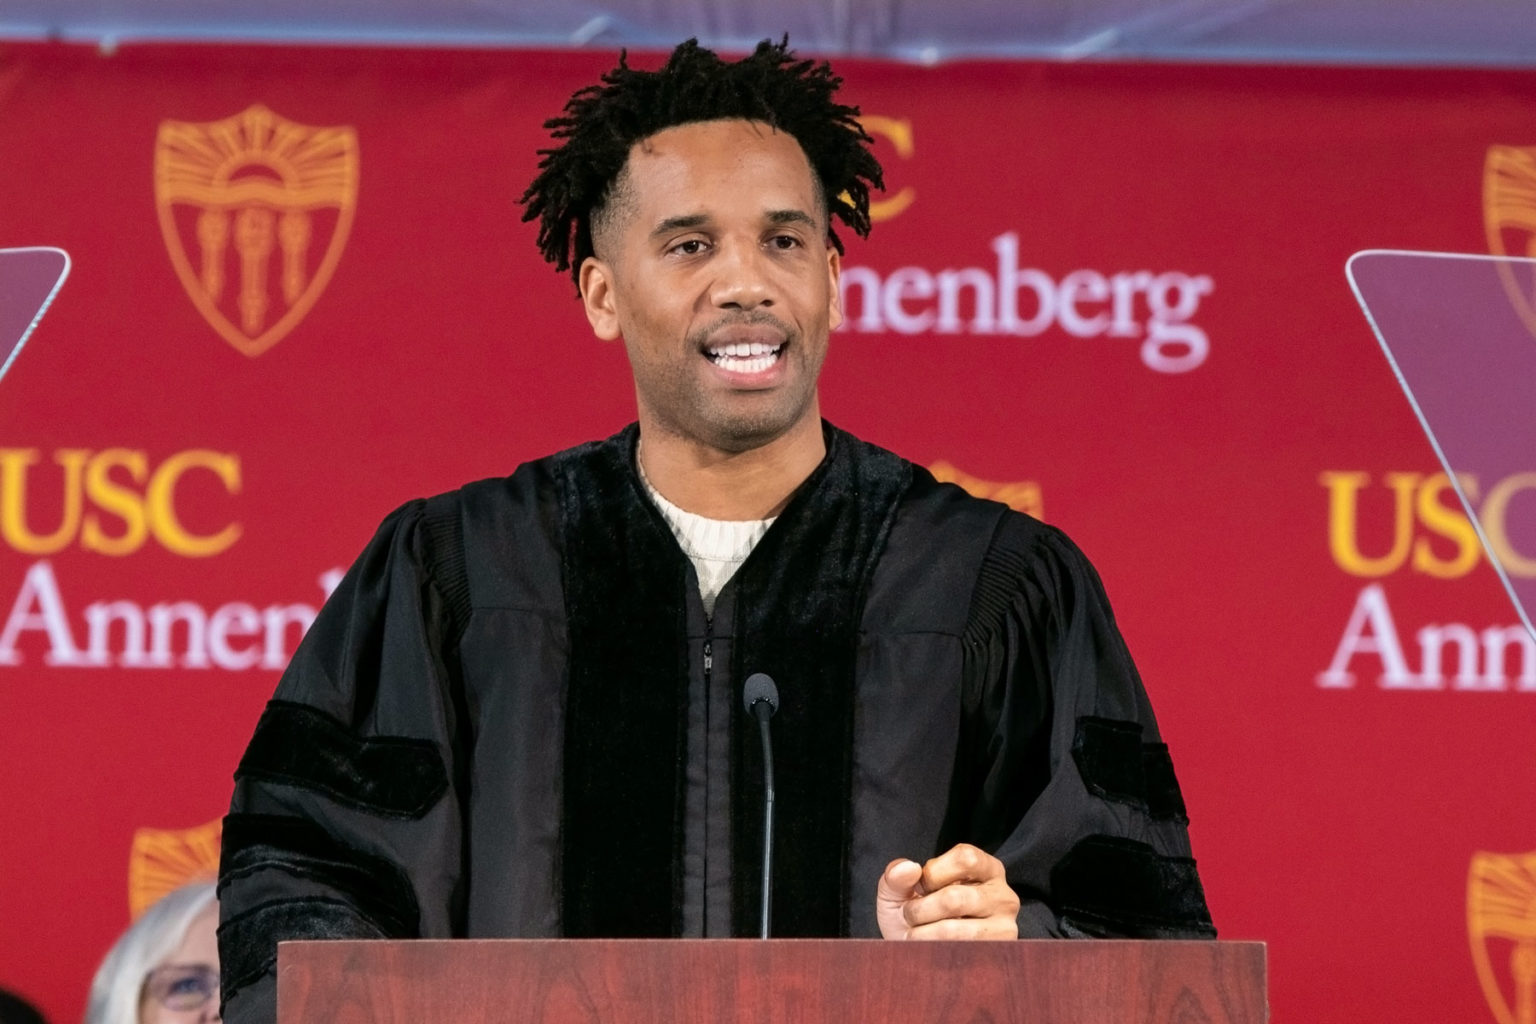 USC校园名人 Maverick Carter -南加州大学中文官网